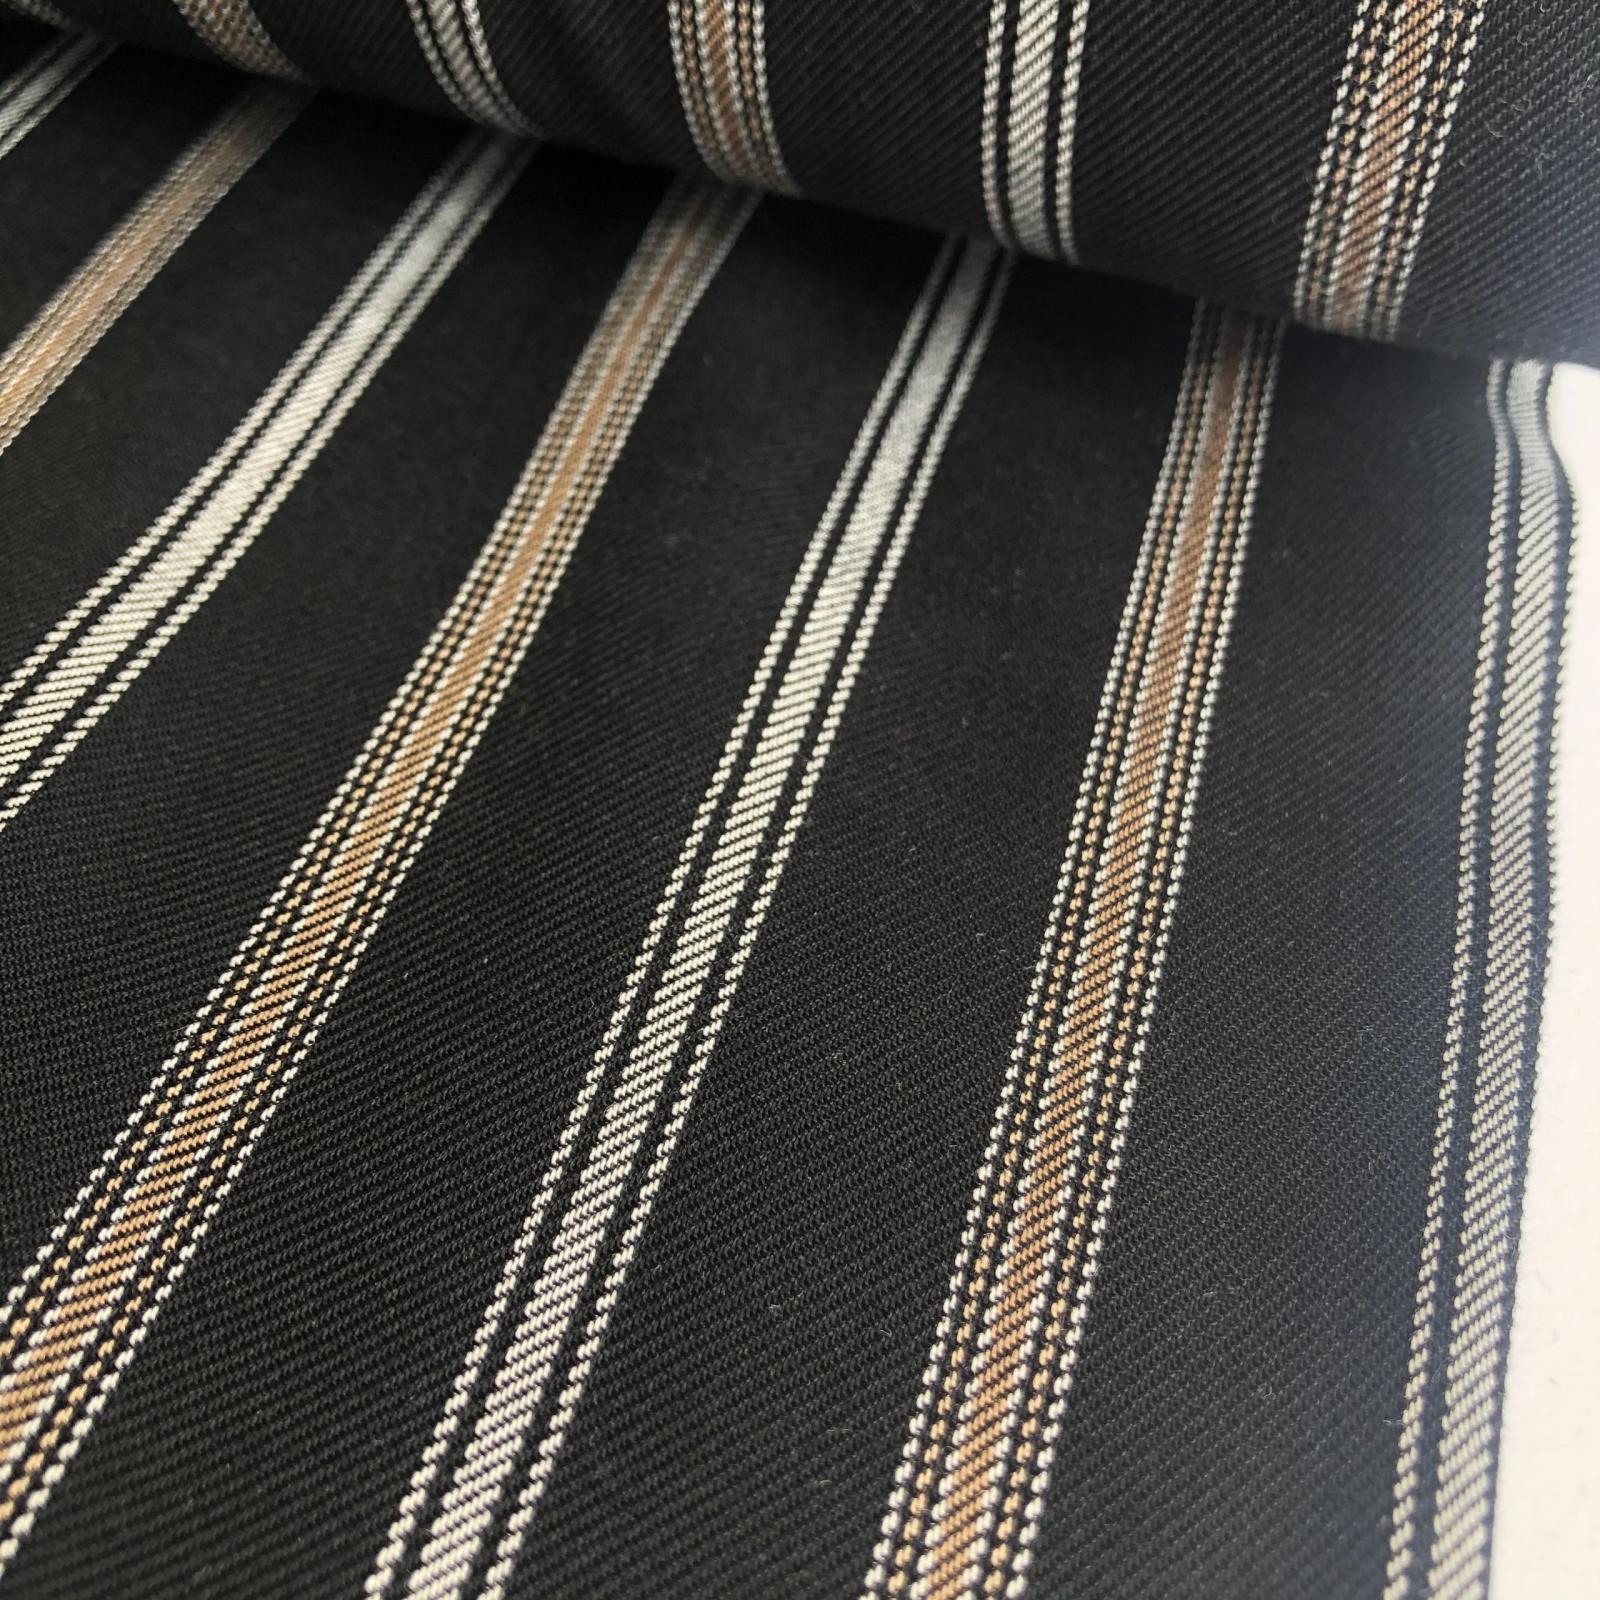 Deadstock Rayon Twill Challis - Multi Stripe Black